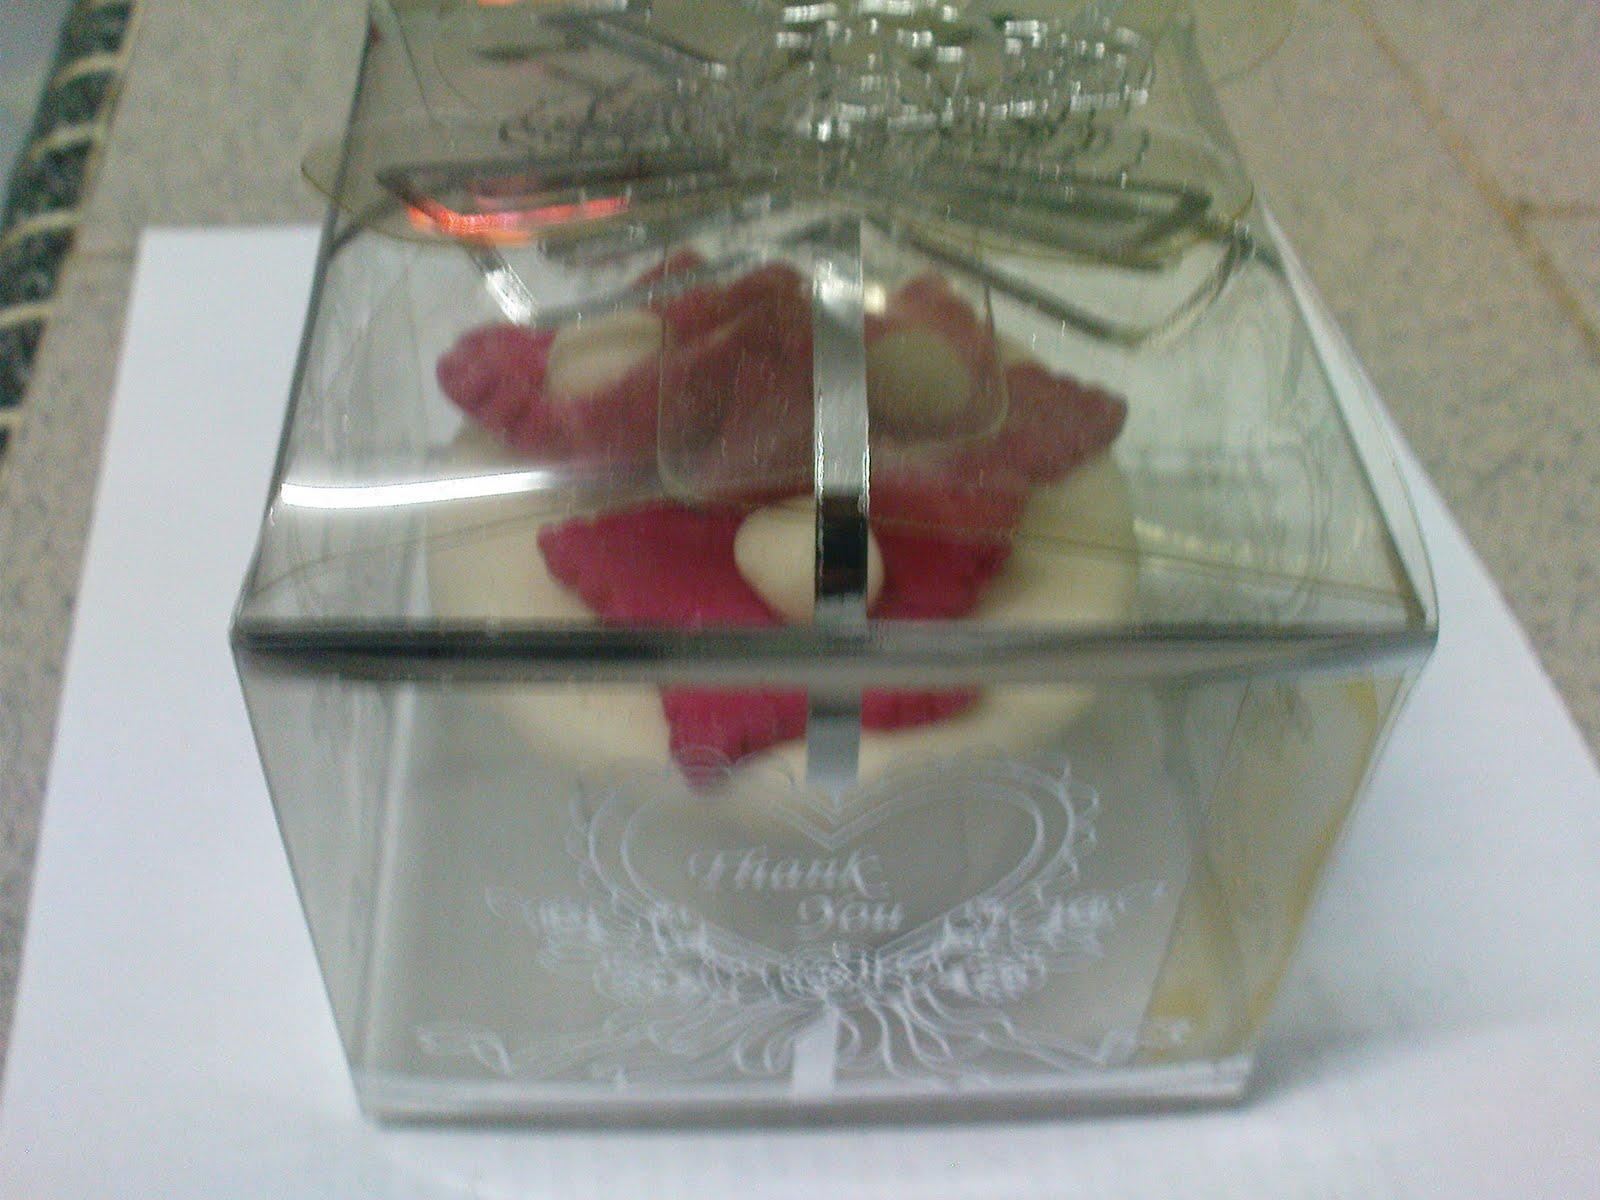 Contoh Door Gift: Imani's Homemade Bakery: CONTOH-CONTOH DOORGIFT N BOX